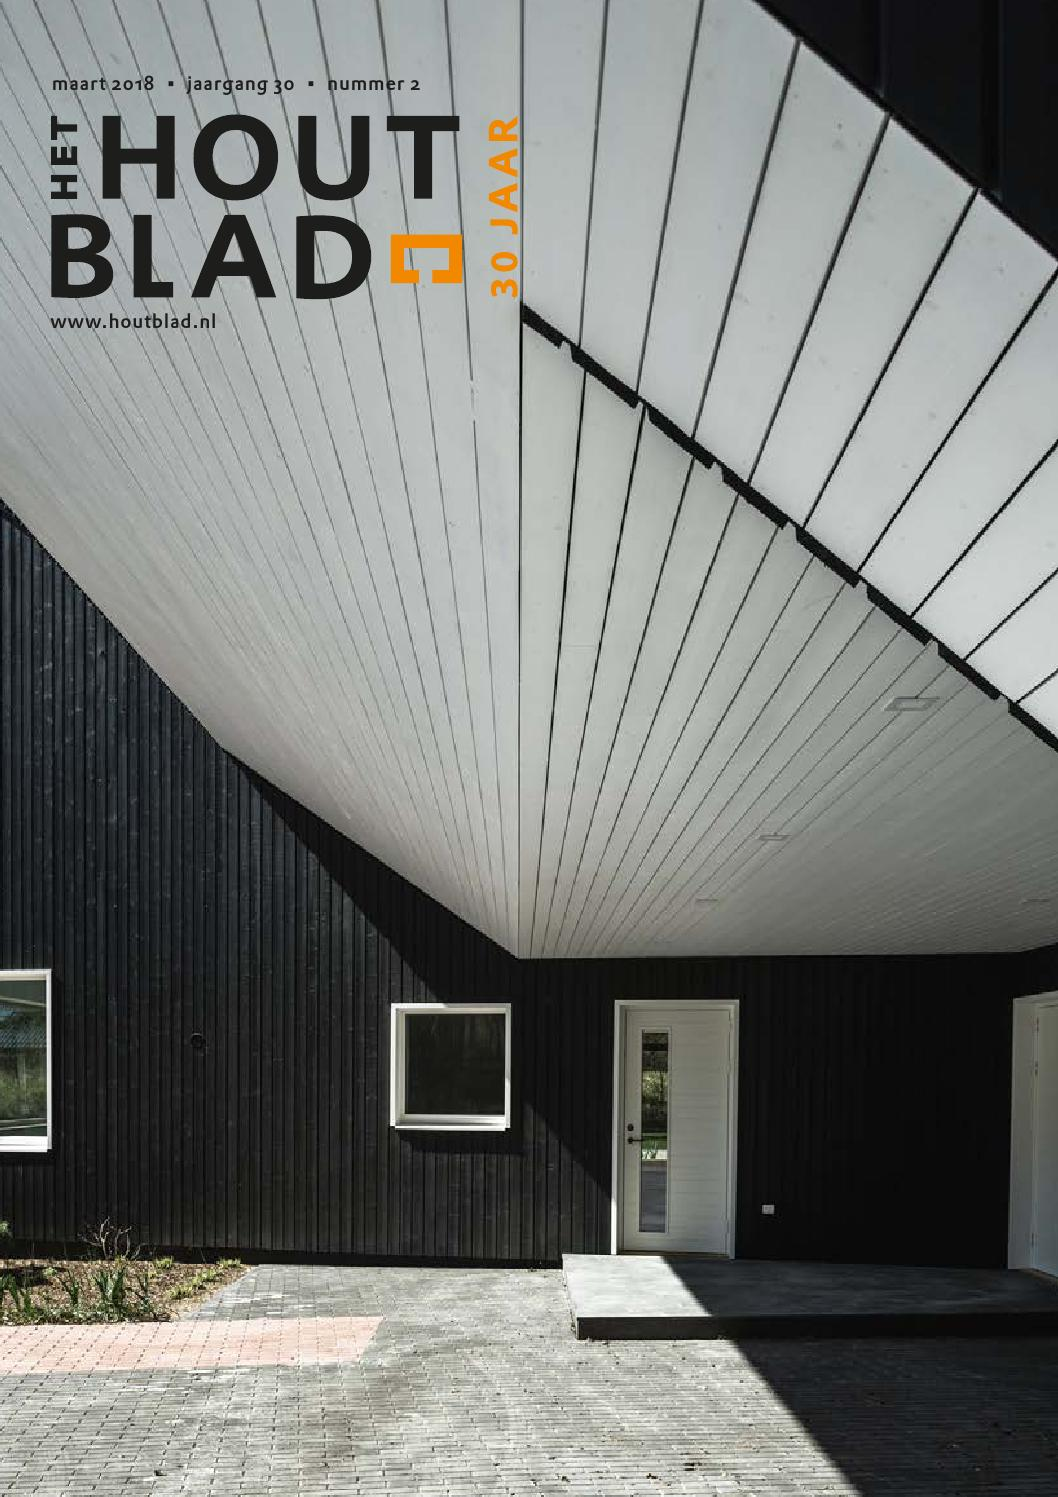 Houthandel Van Dam Artikelen In Hout (Fabricage